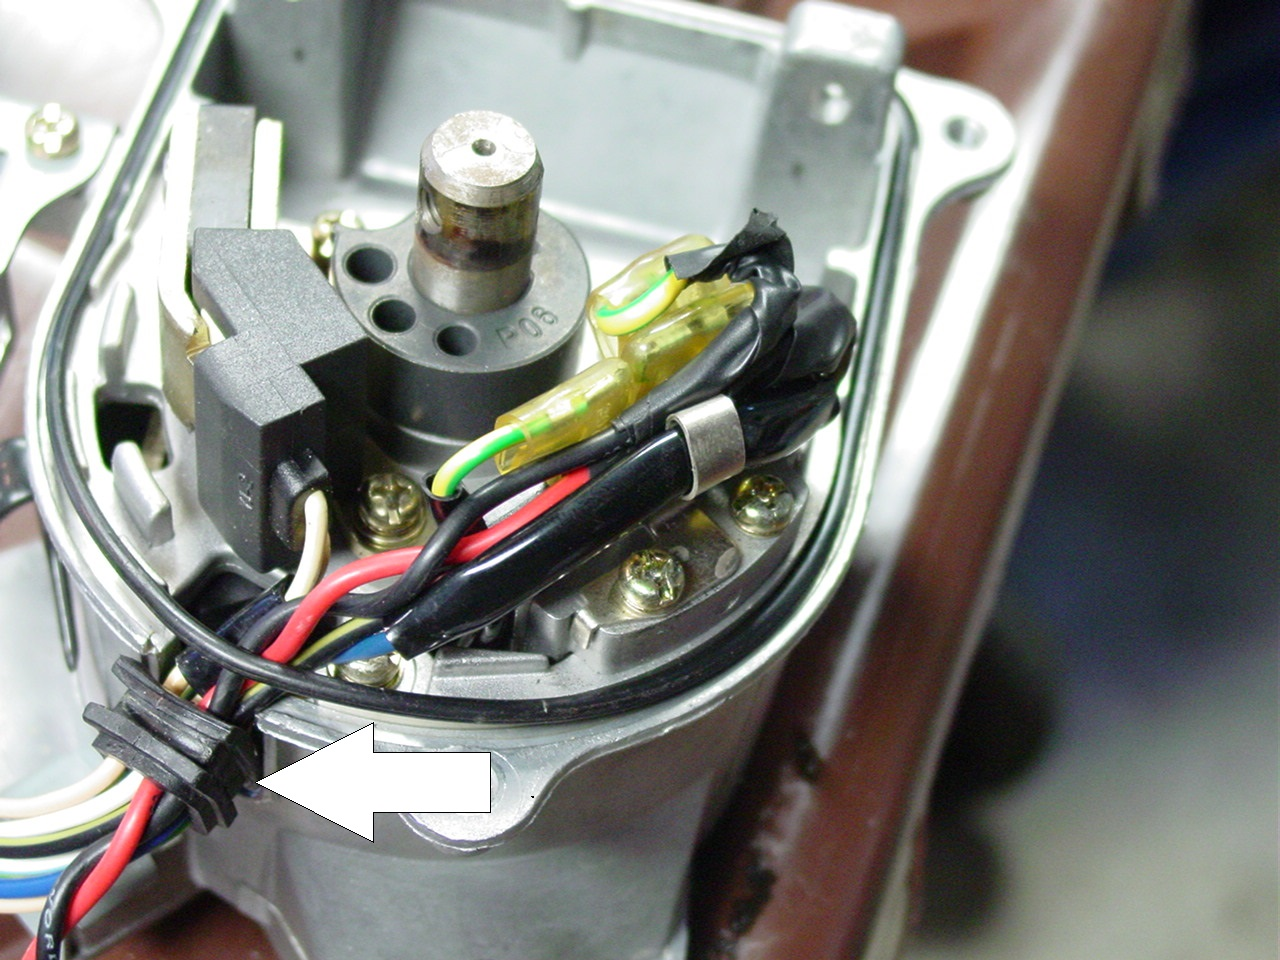 hight resolution of wiring diagram msd soft touch msd soft touch rev control msd 6aln 6430 wiring diagram msd 6al wiring diagram